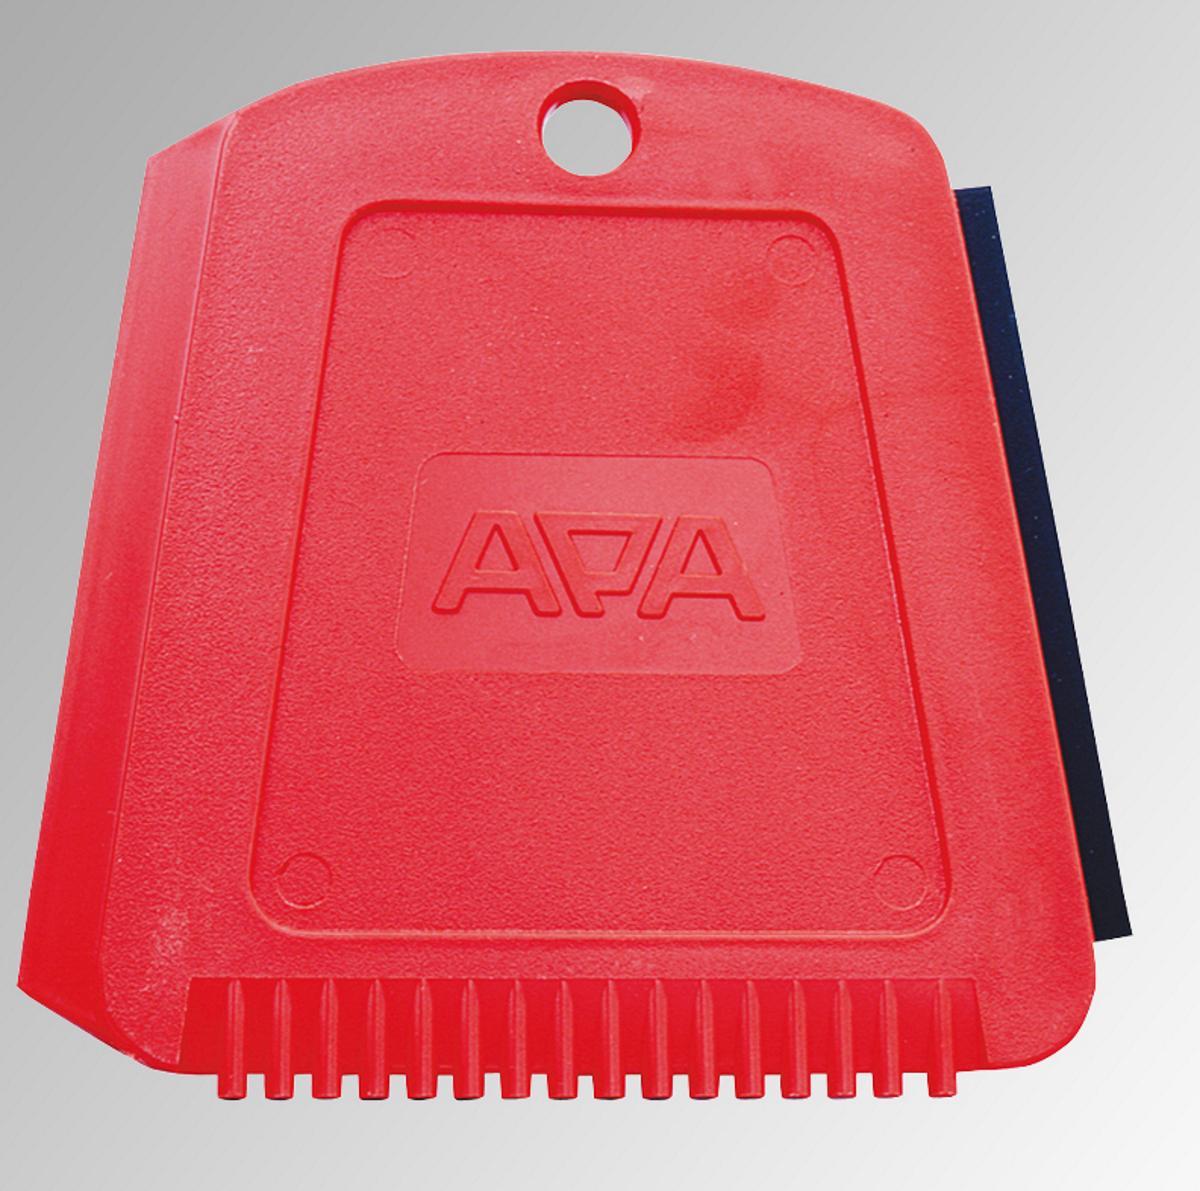 Name:  apa-trapez-eiskratzer-76138-0.jpg Views: 471 Size:  146.9 KB